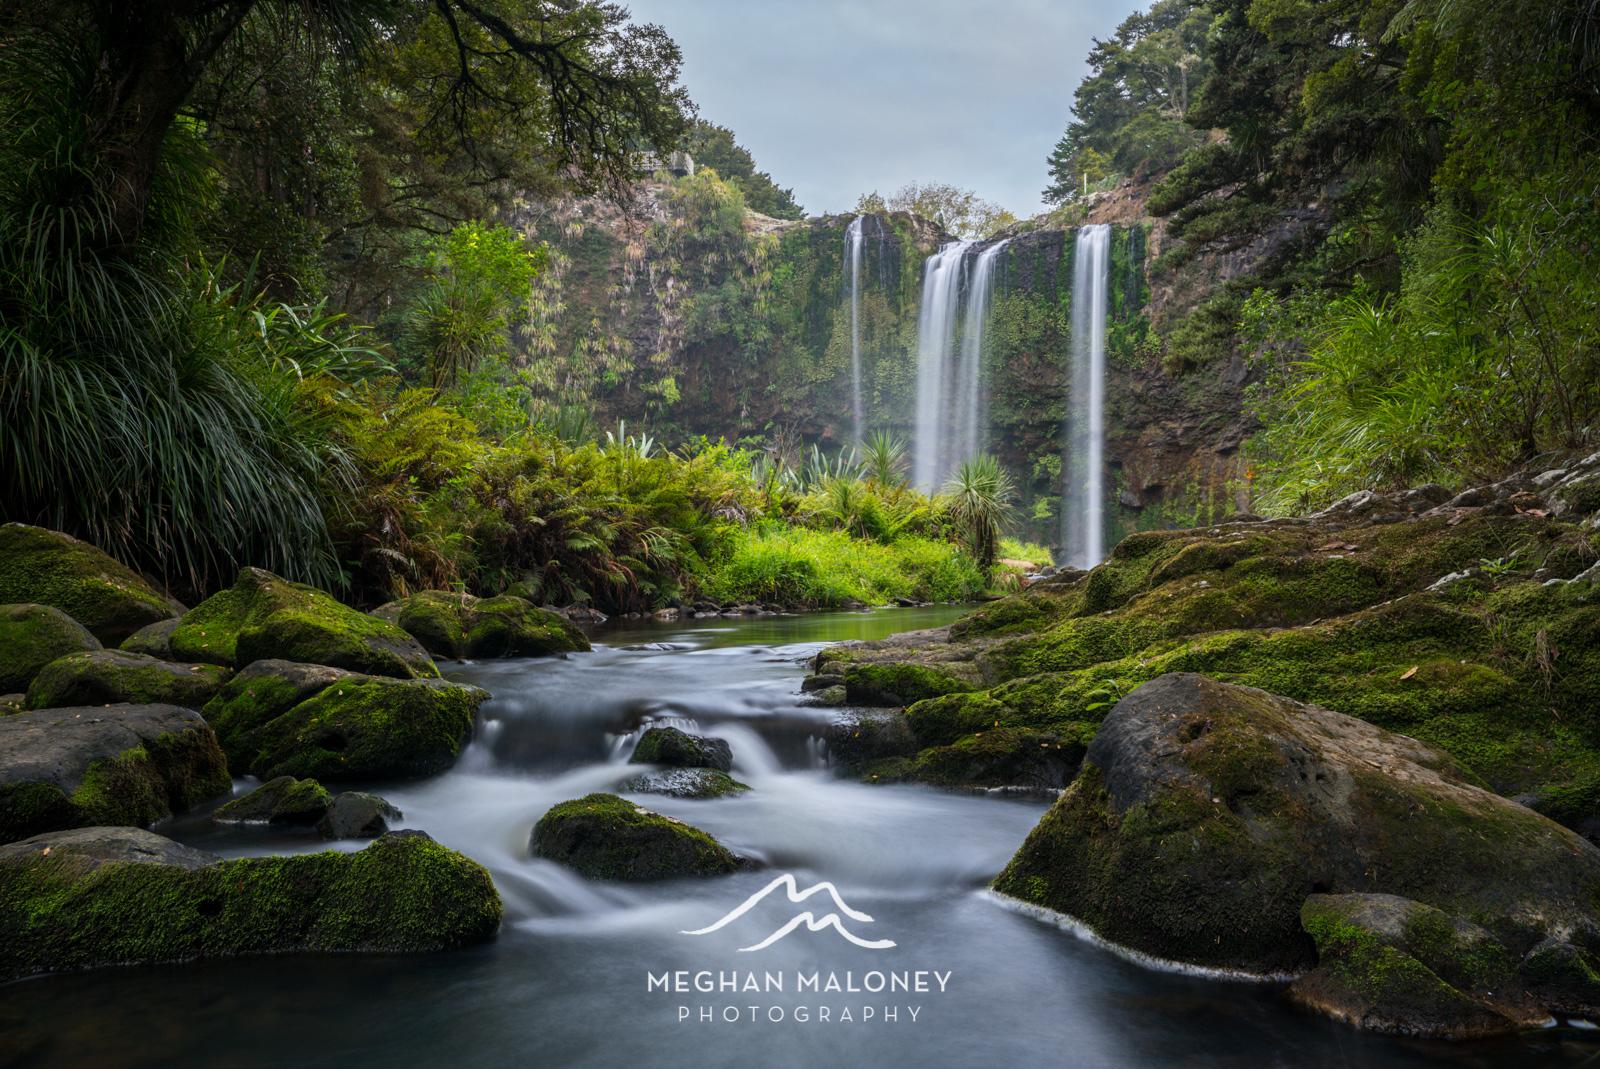 Whangarei Falls Quiet Flow